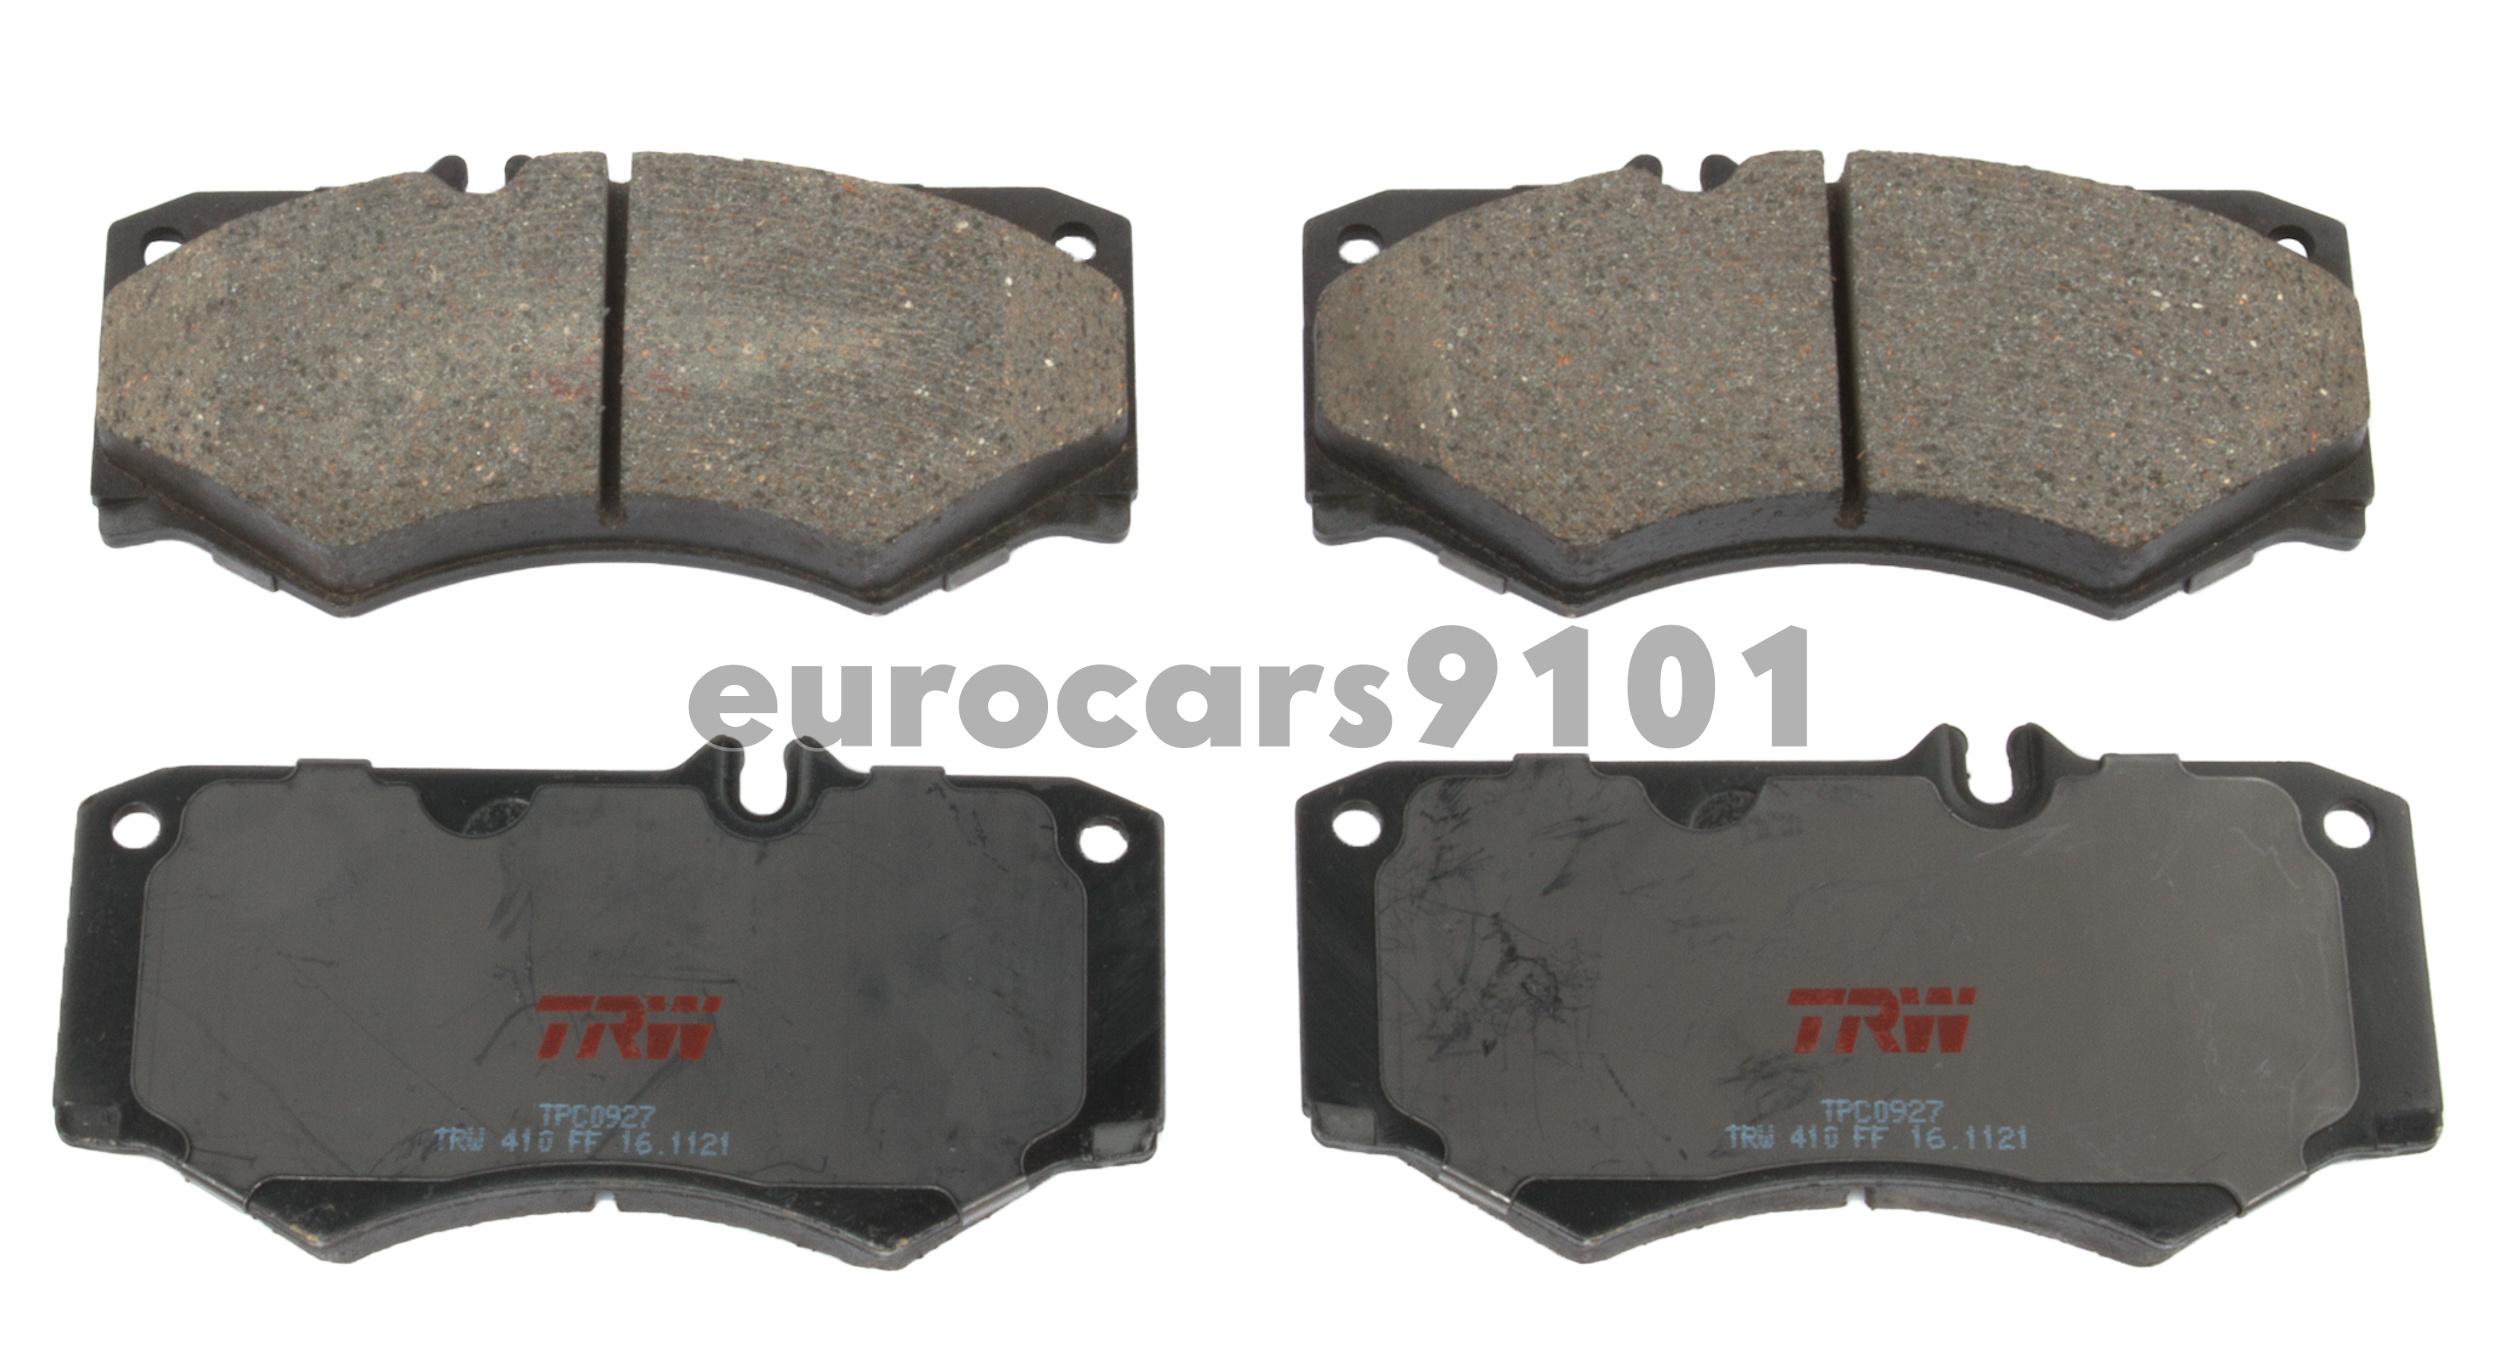 New OEM Factory Mercedes-Benz 7829-D928 Disc Brake Pad Pads